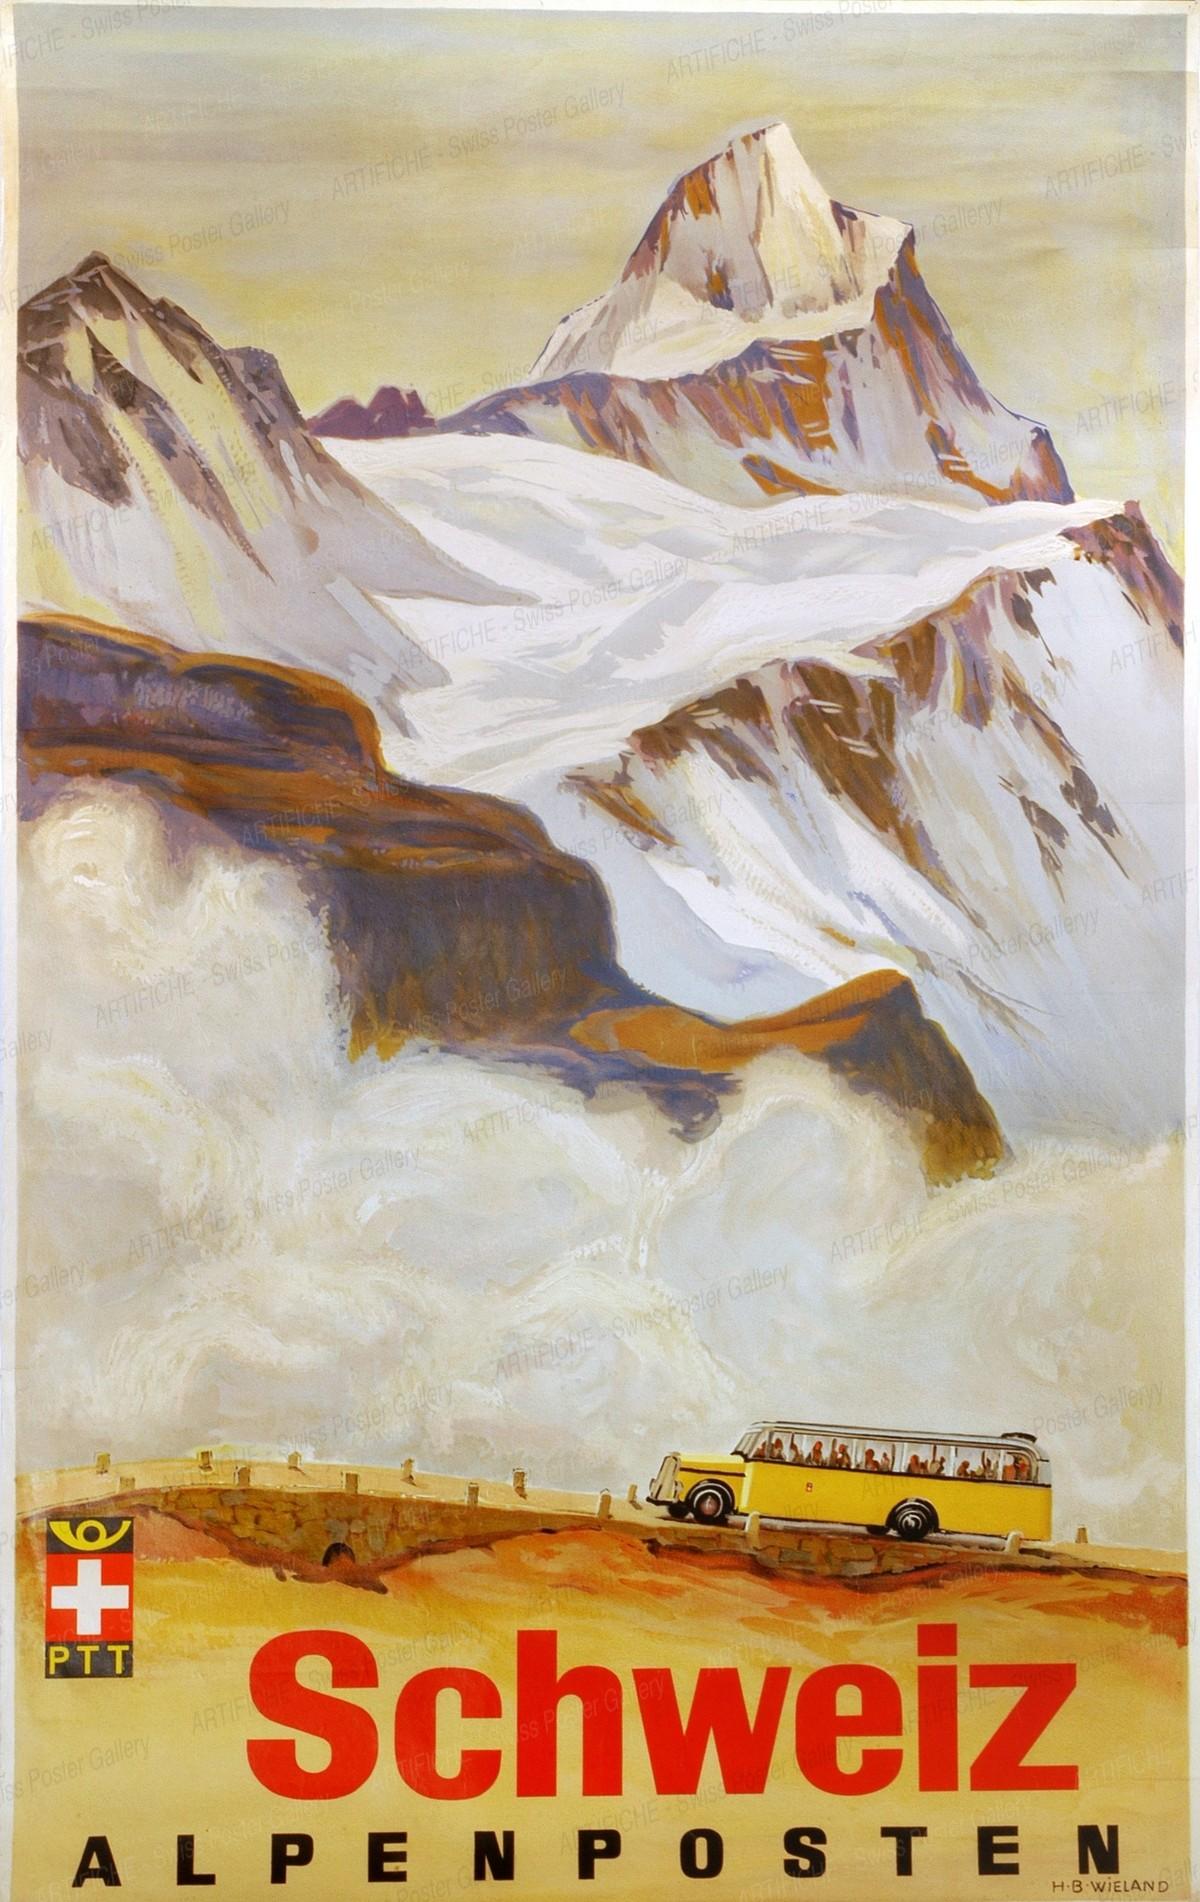 Schweiz Alpenposten, Hans Beat Wieland